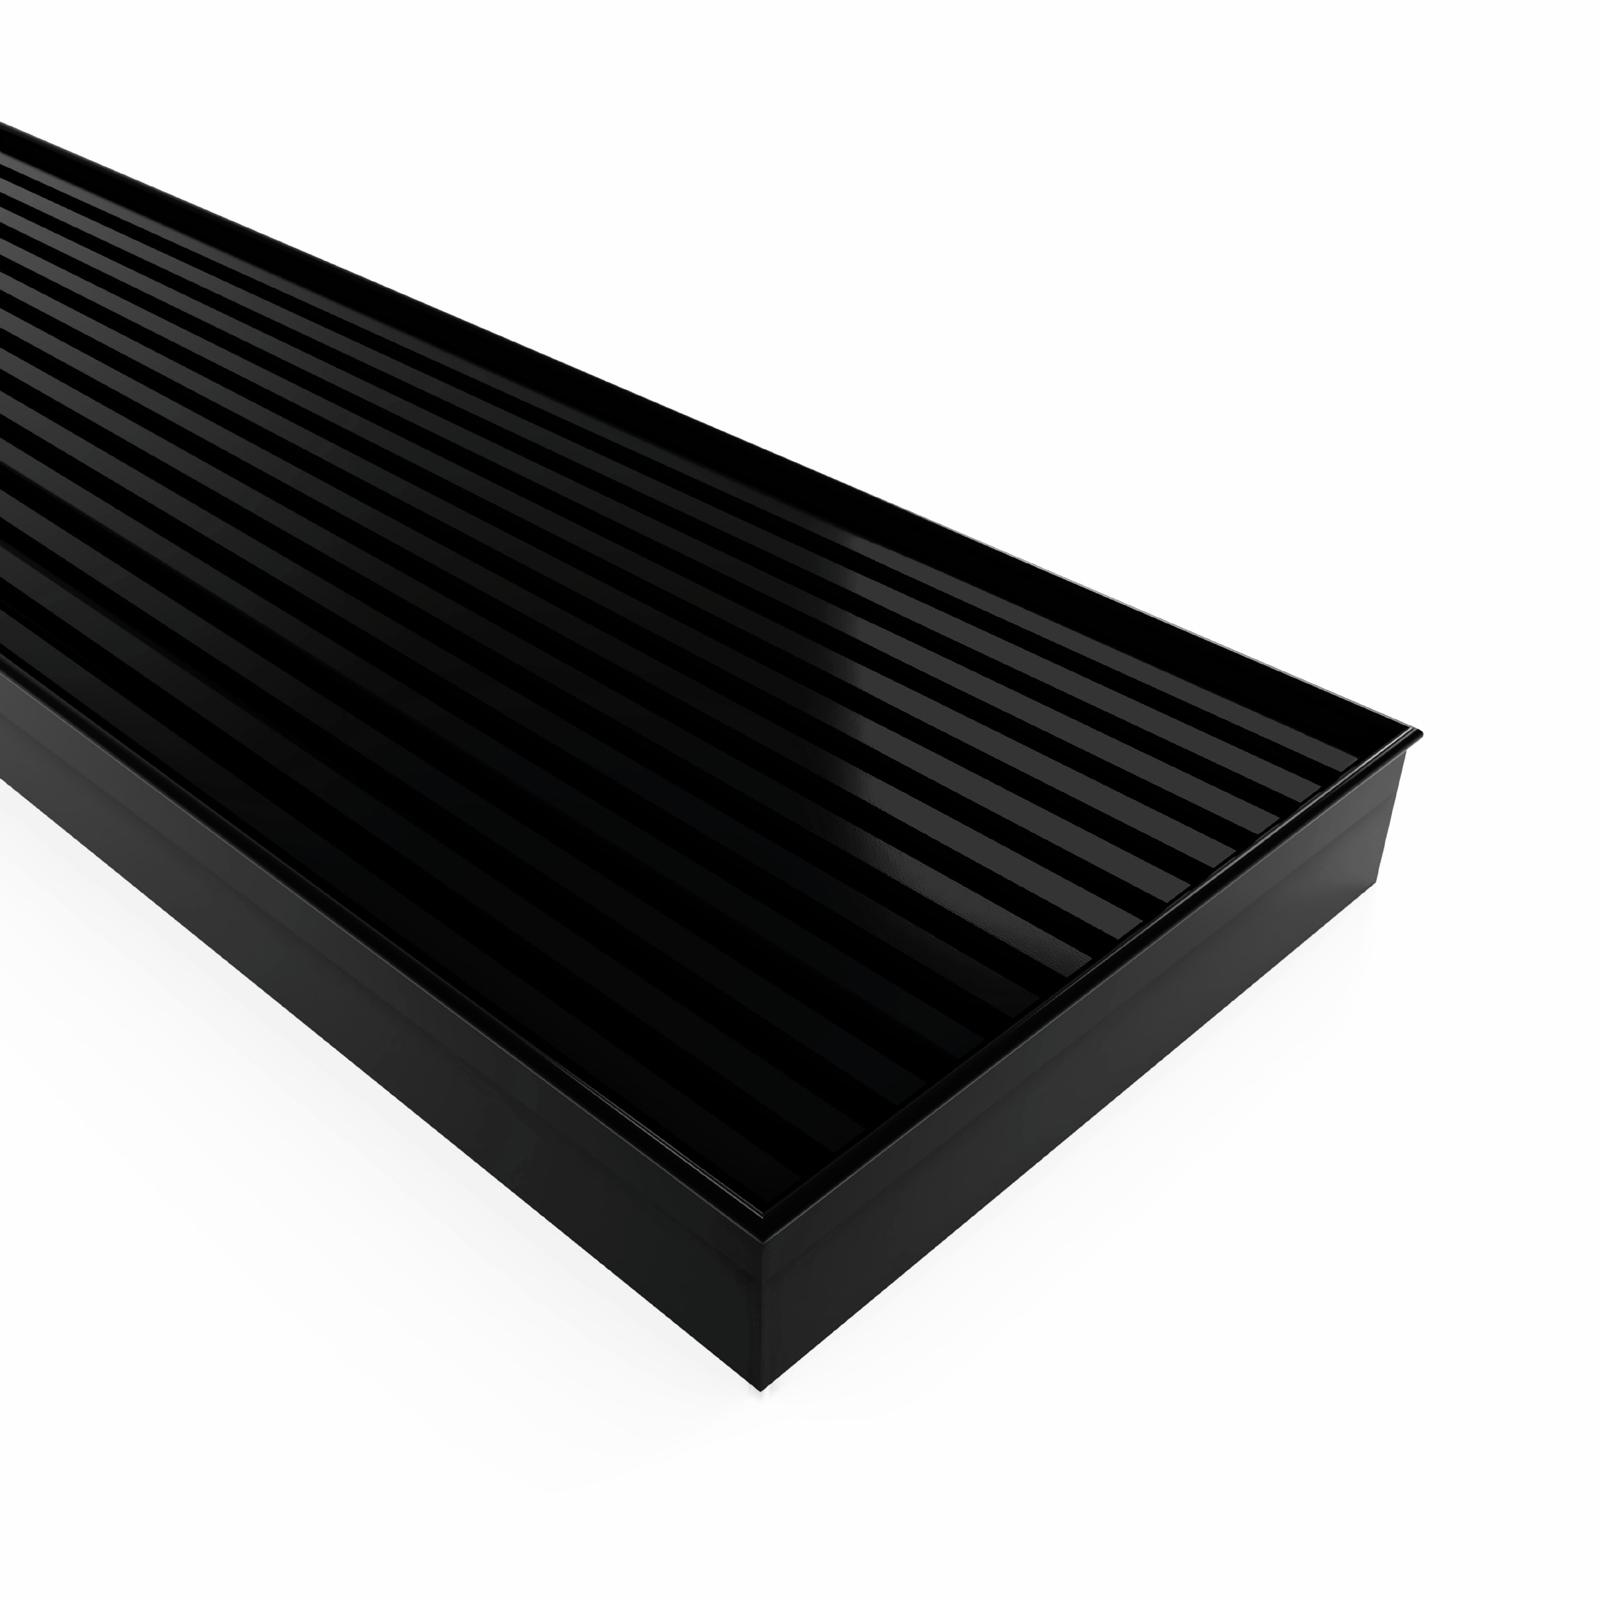 Forme 1200 × 100mm Black Satin Stainless Steel Mesh Floor Waste